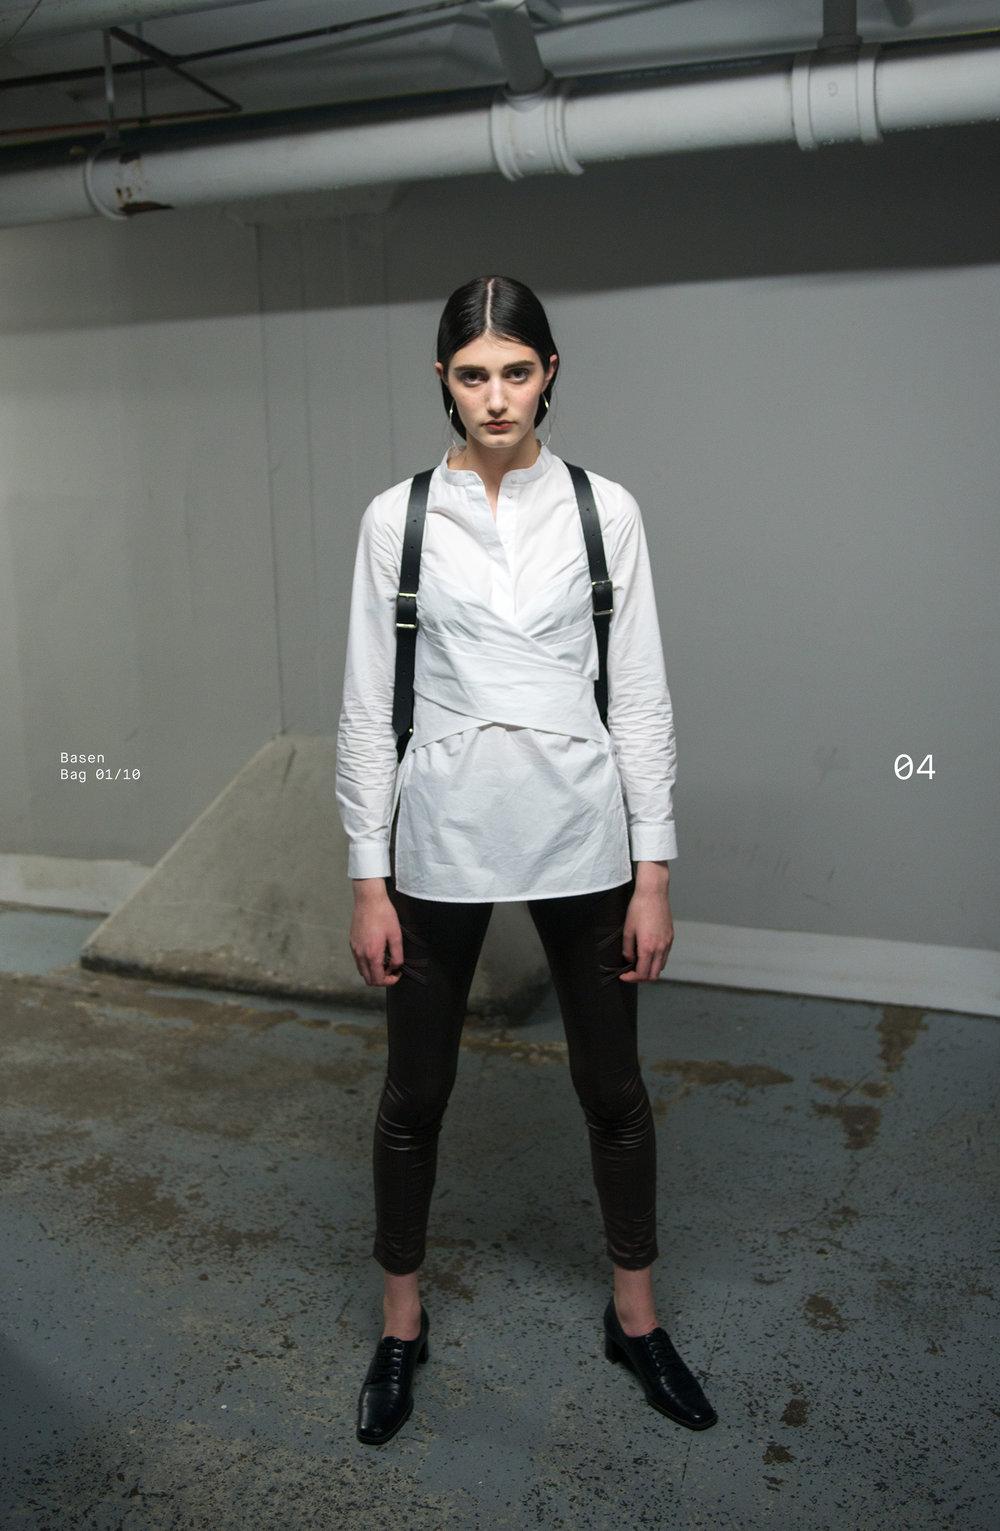 Sonya Lee - Basen bag 01/10